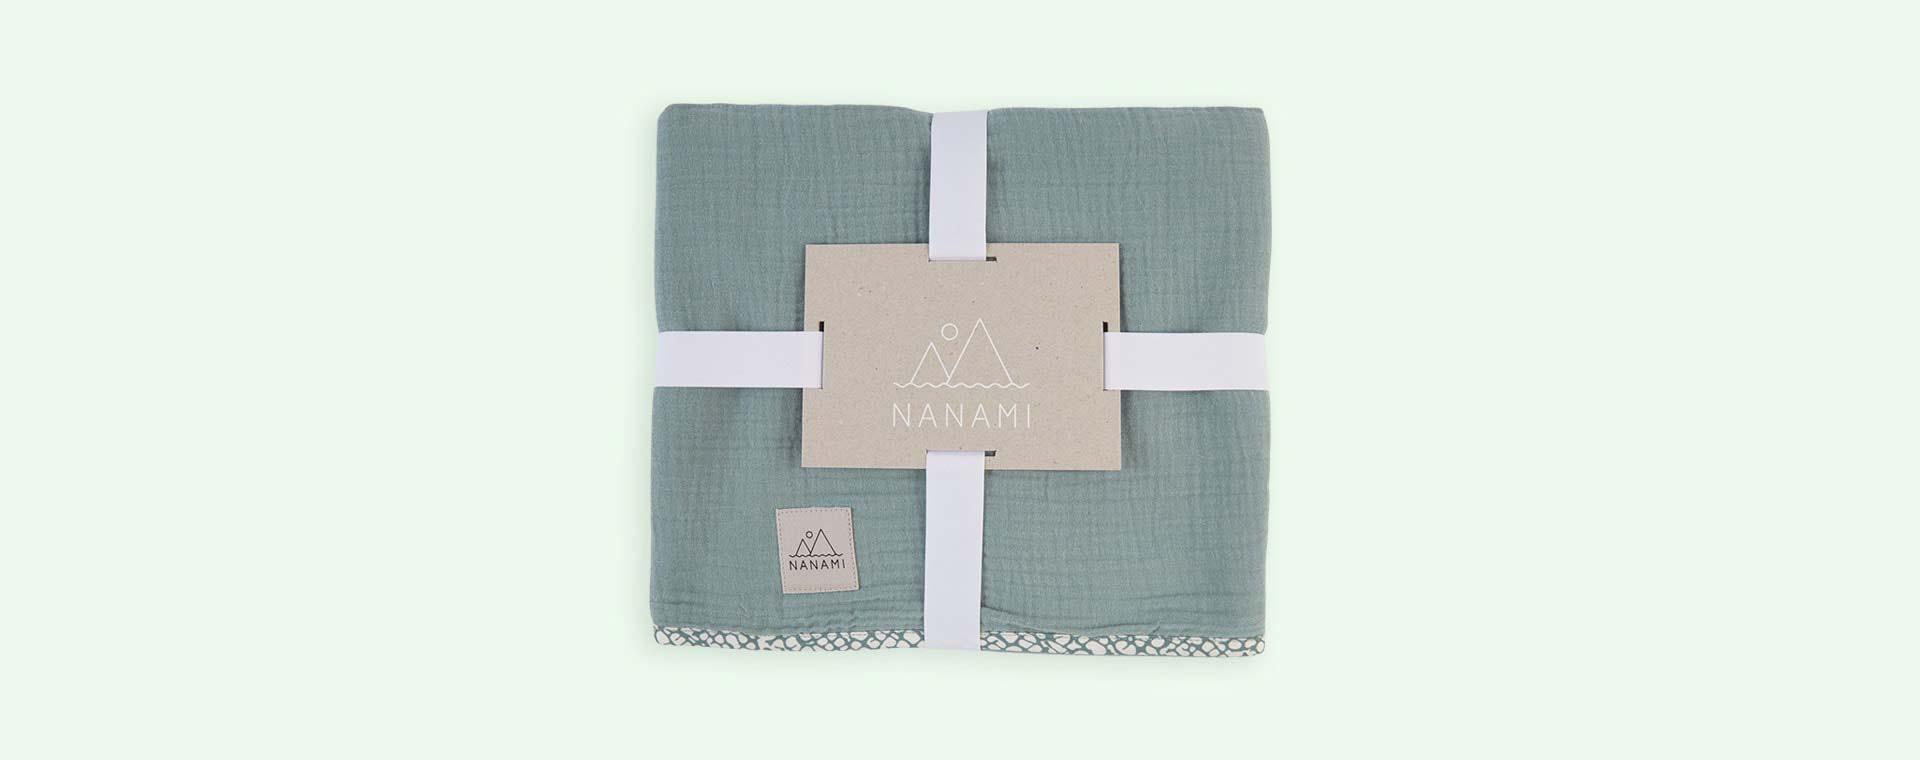 Mint Nanami Reversible Double Blanket